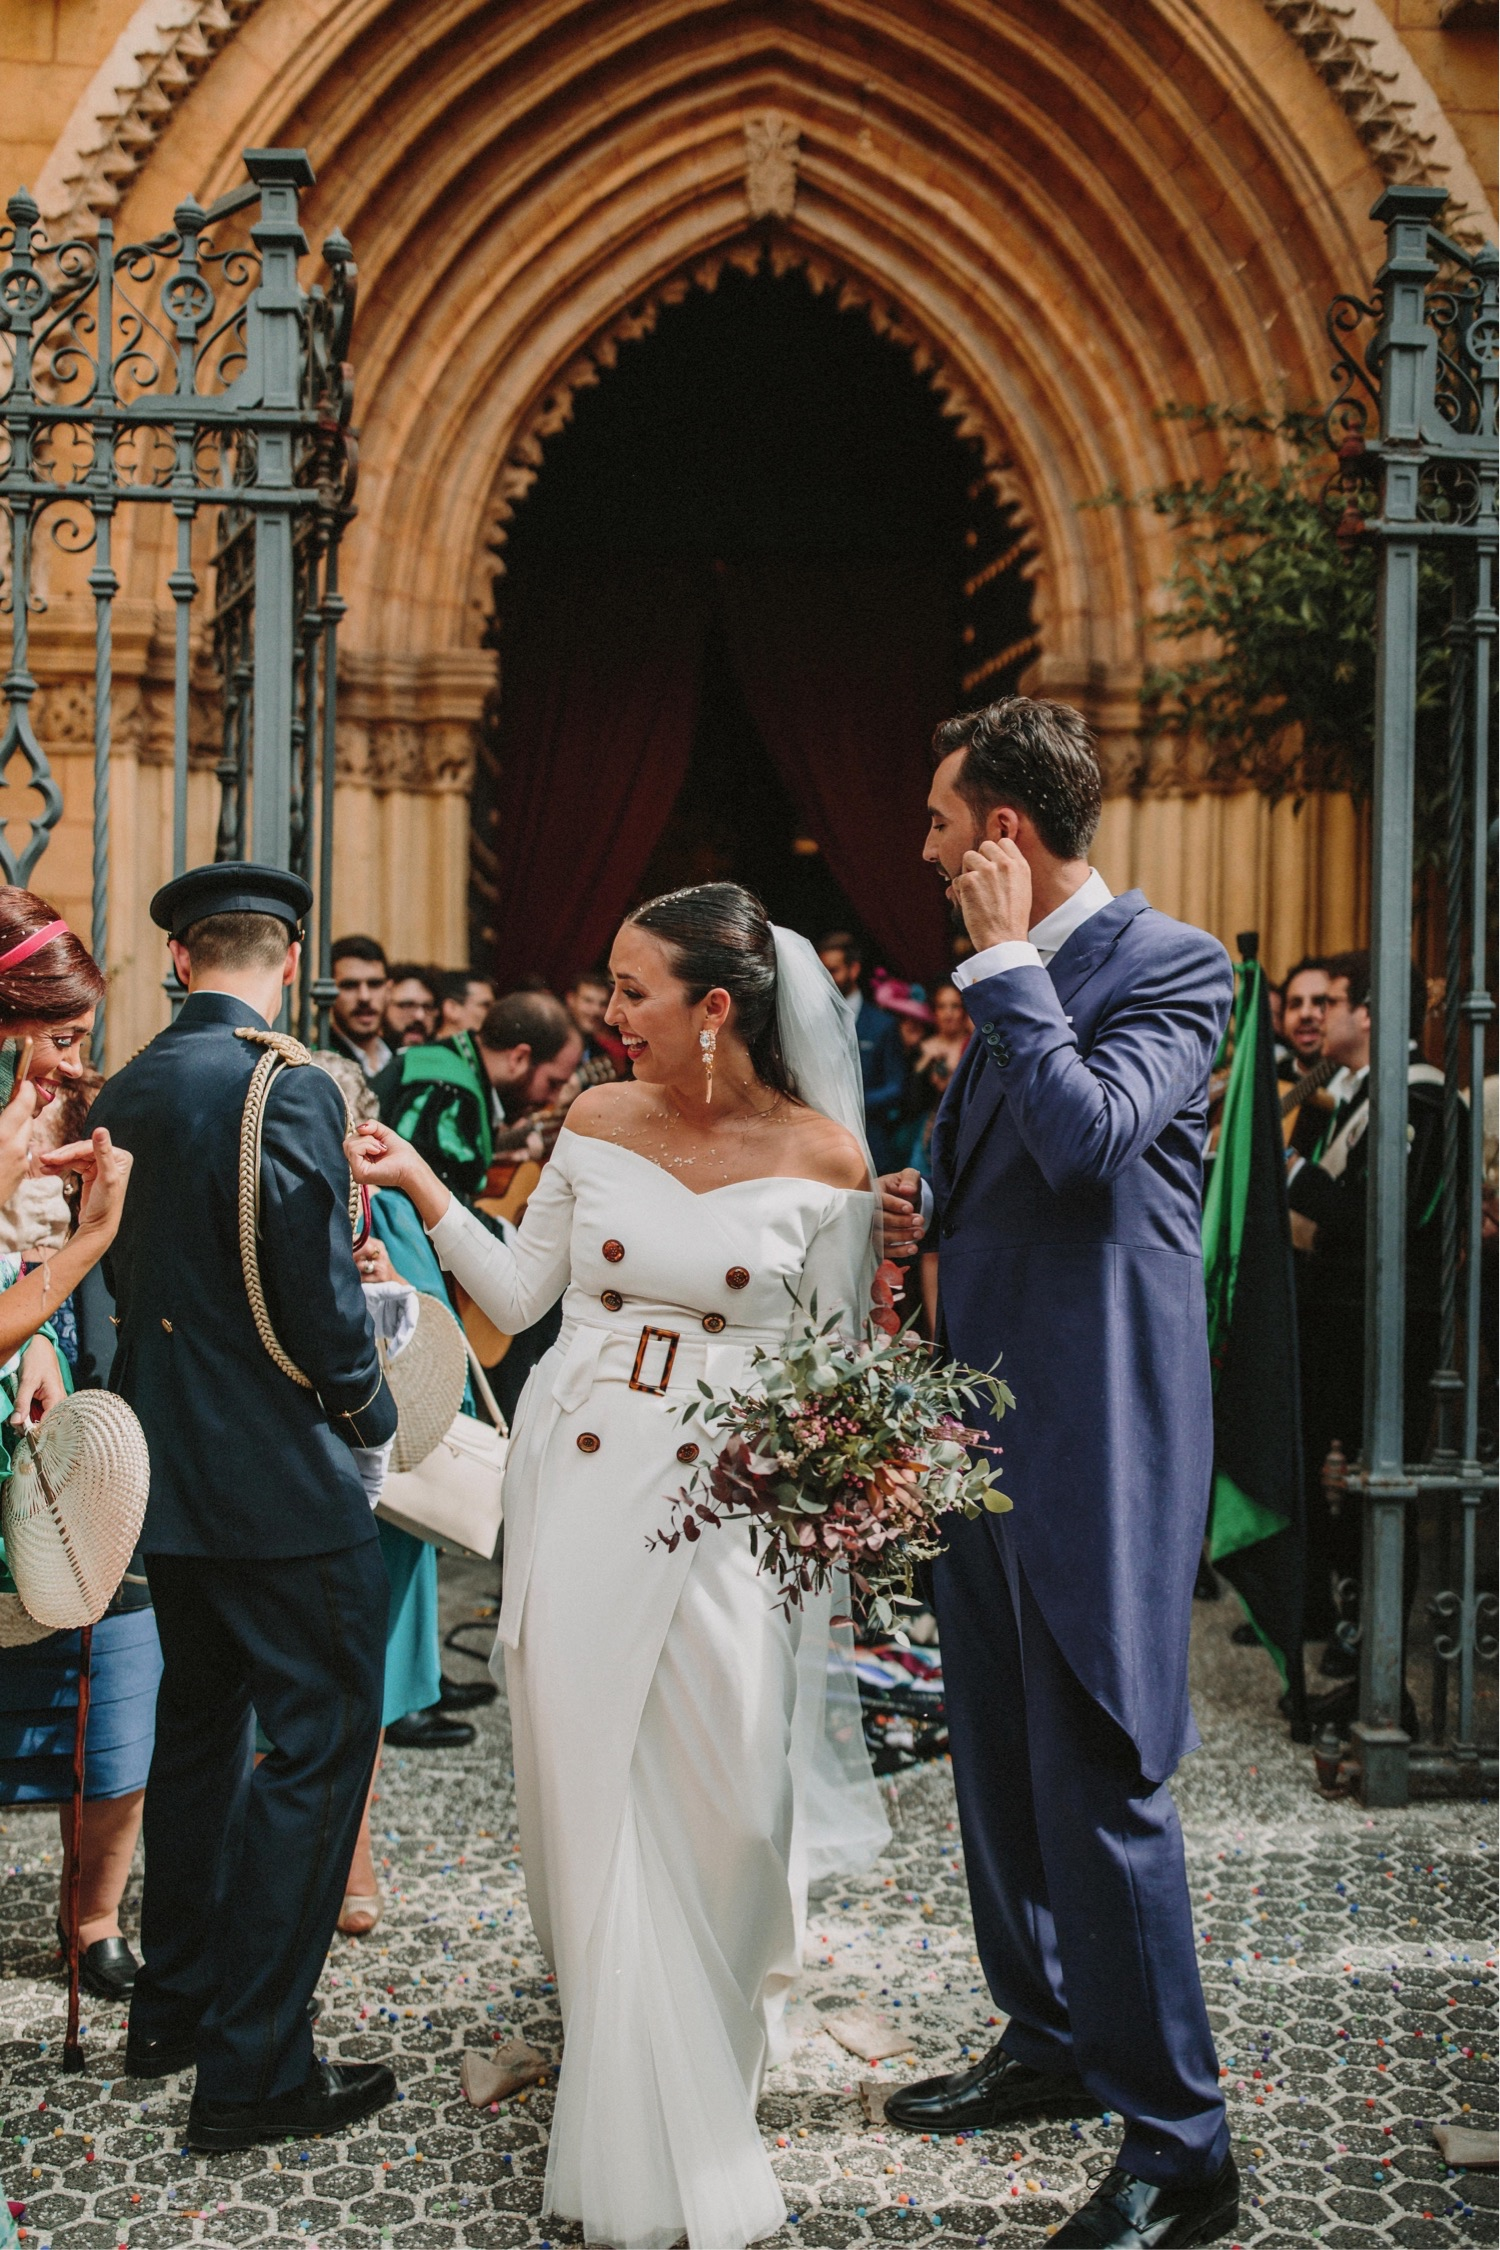 31_wedding-ernestovillalba-anabel-diego-2530-ASE.jpg